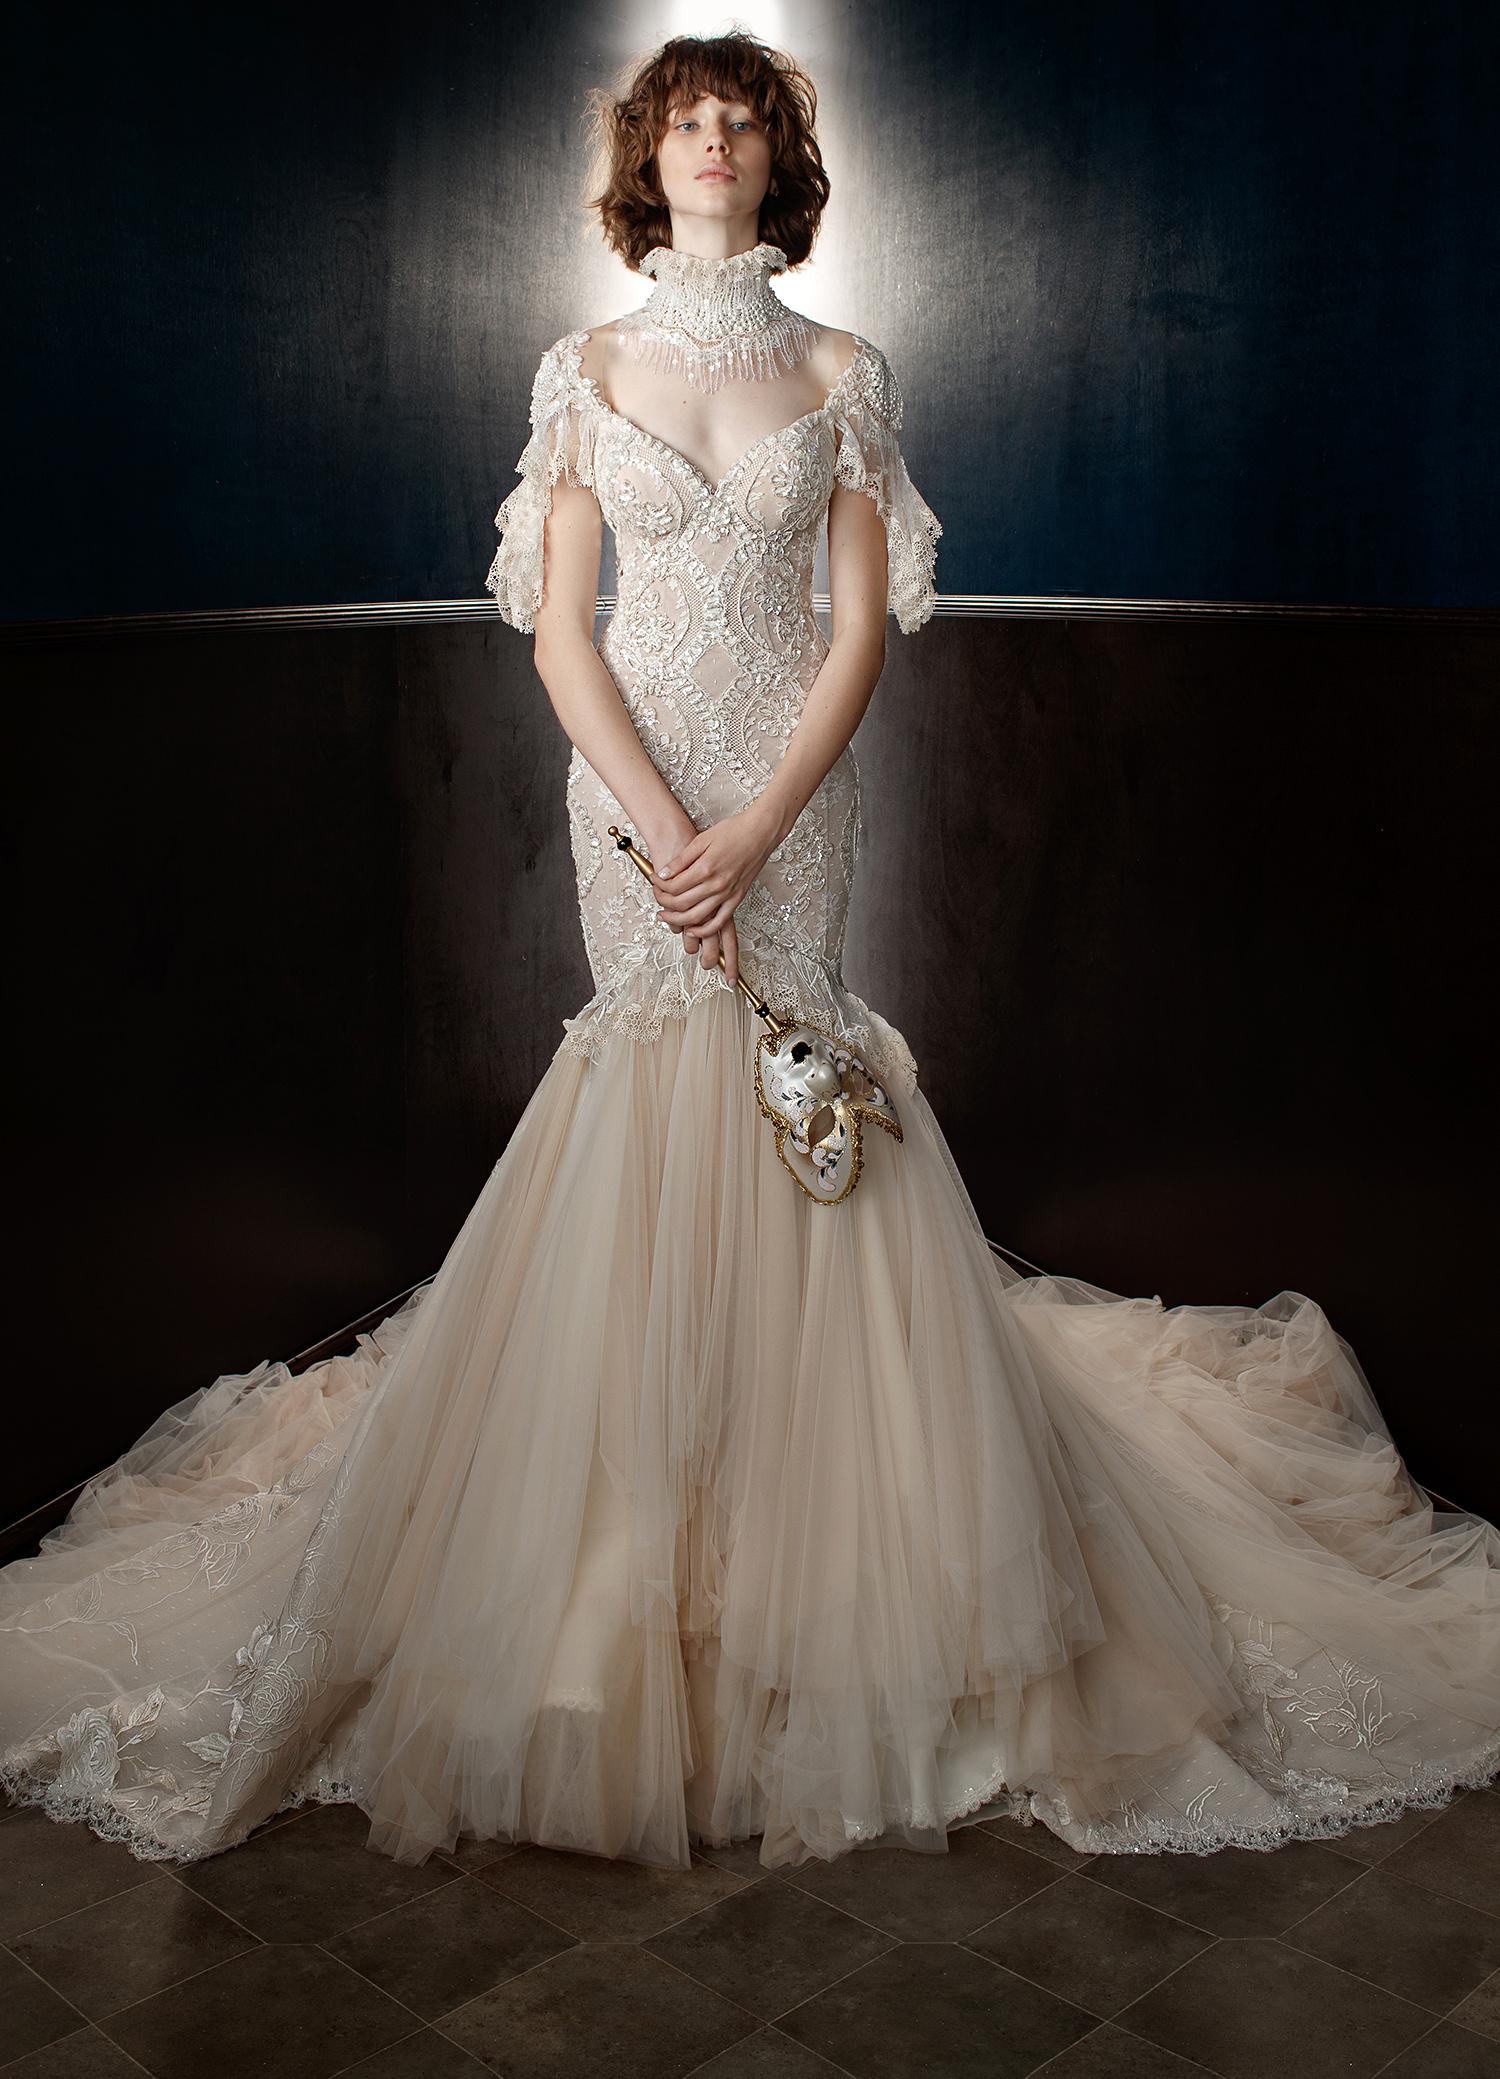 galia lahav wedding dress spring 2018 lace mermaid v-neck